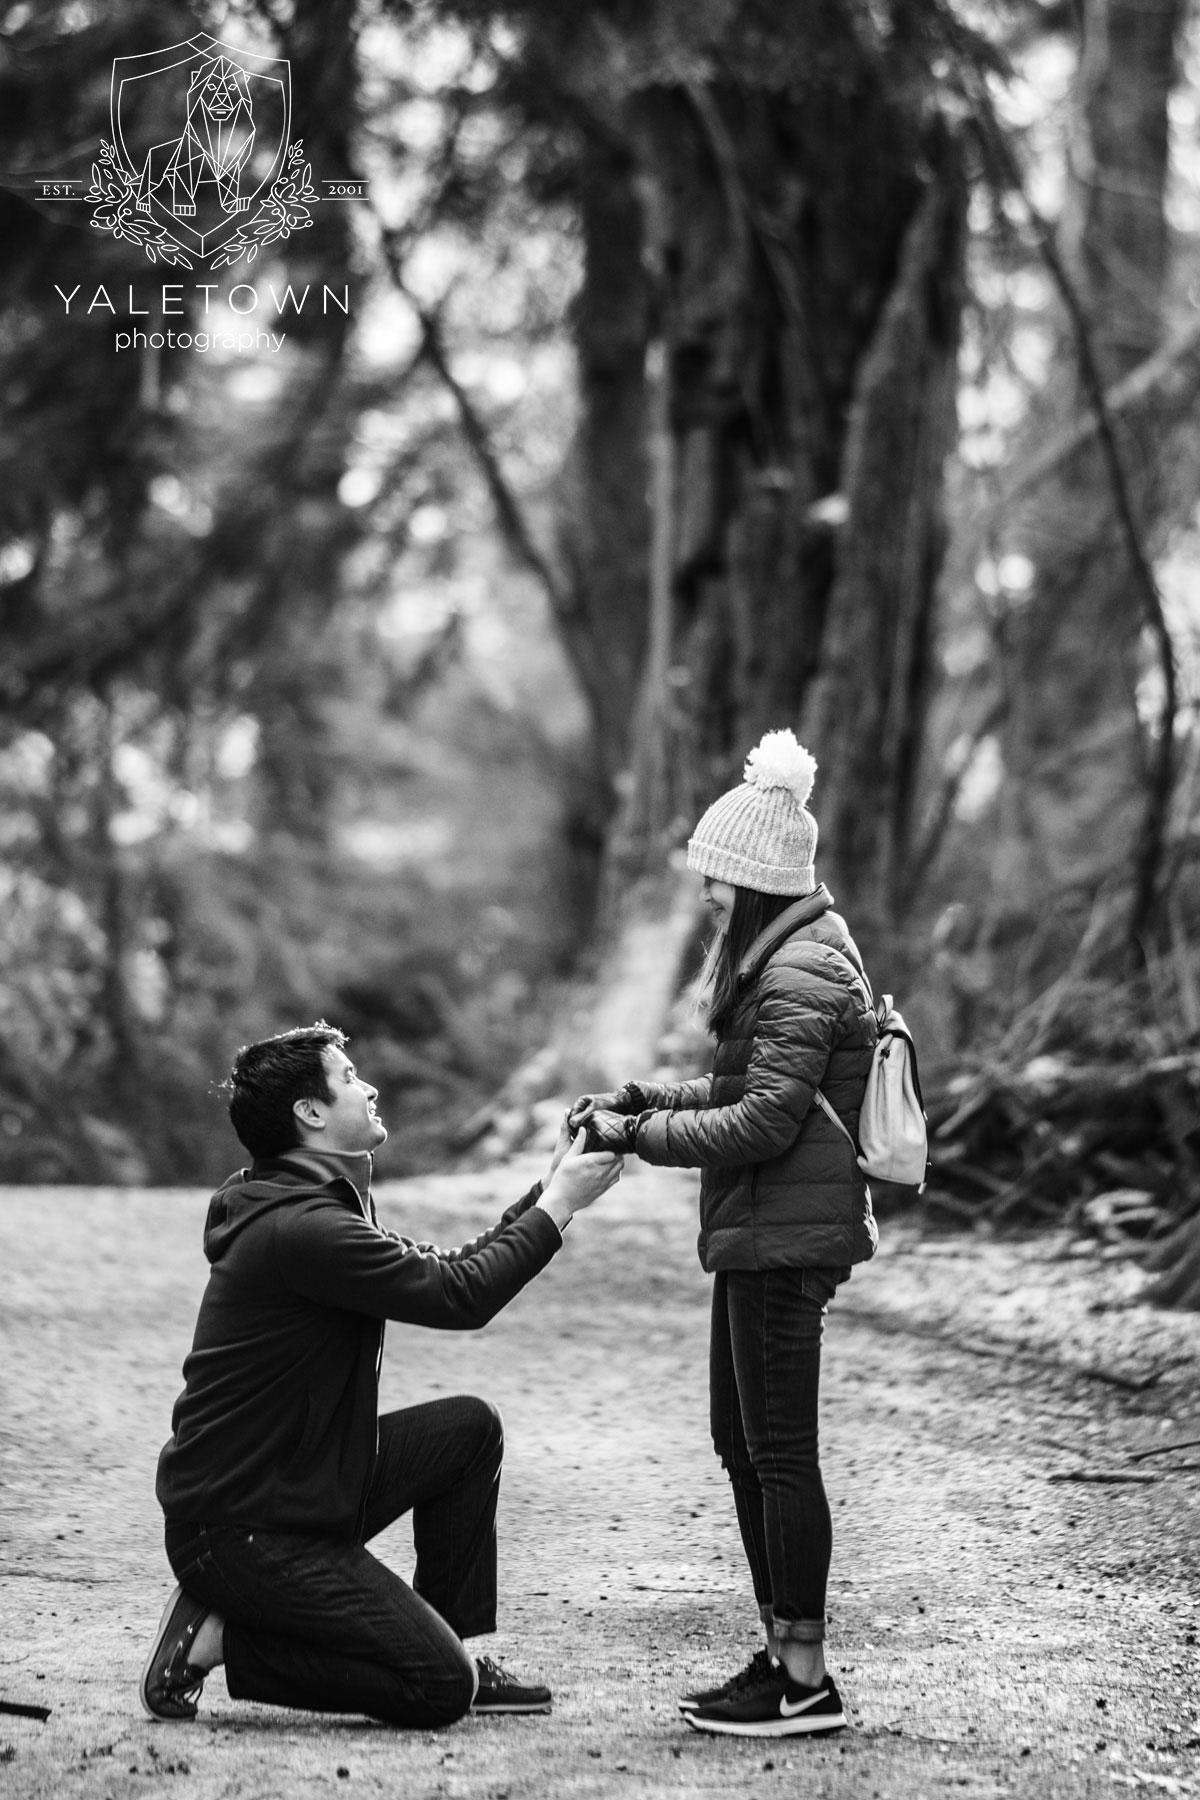 Wedding-Proposal-Vancouver-Stanley-Park-Wedding-Photographer-Vancouver-Yaletown-Photography-Photo-06.JPG